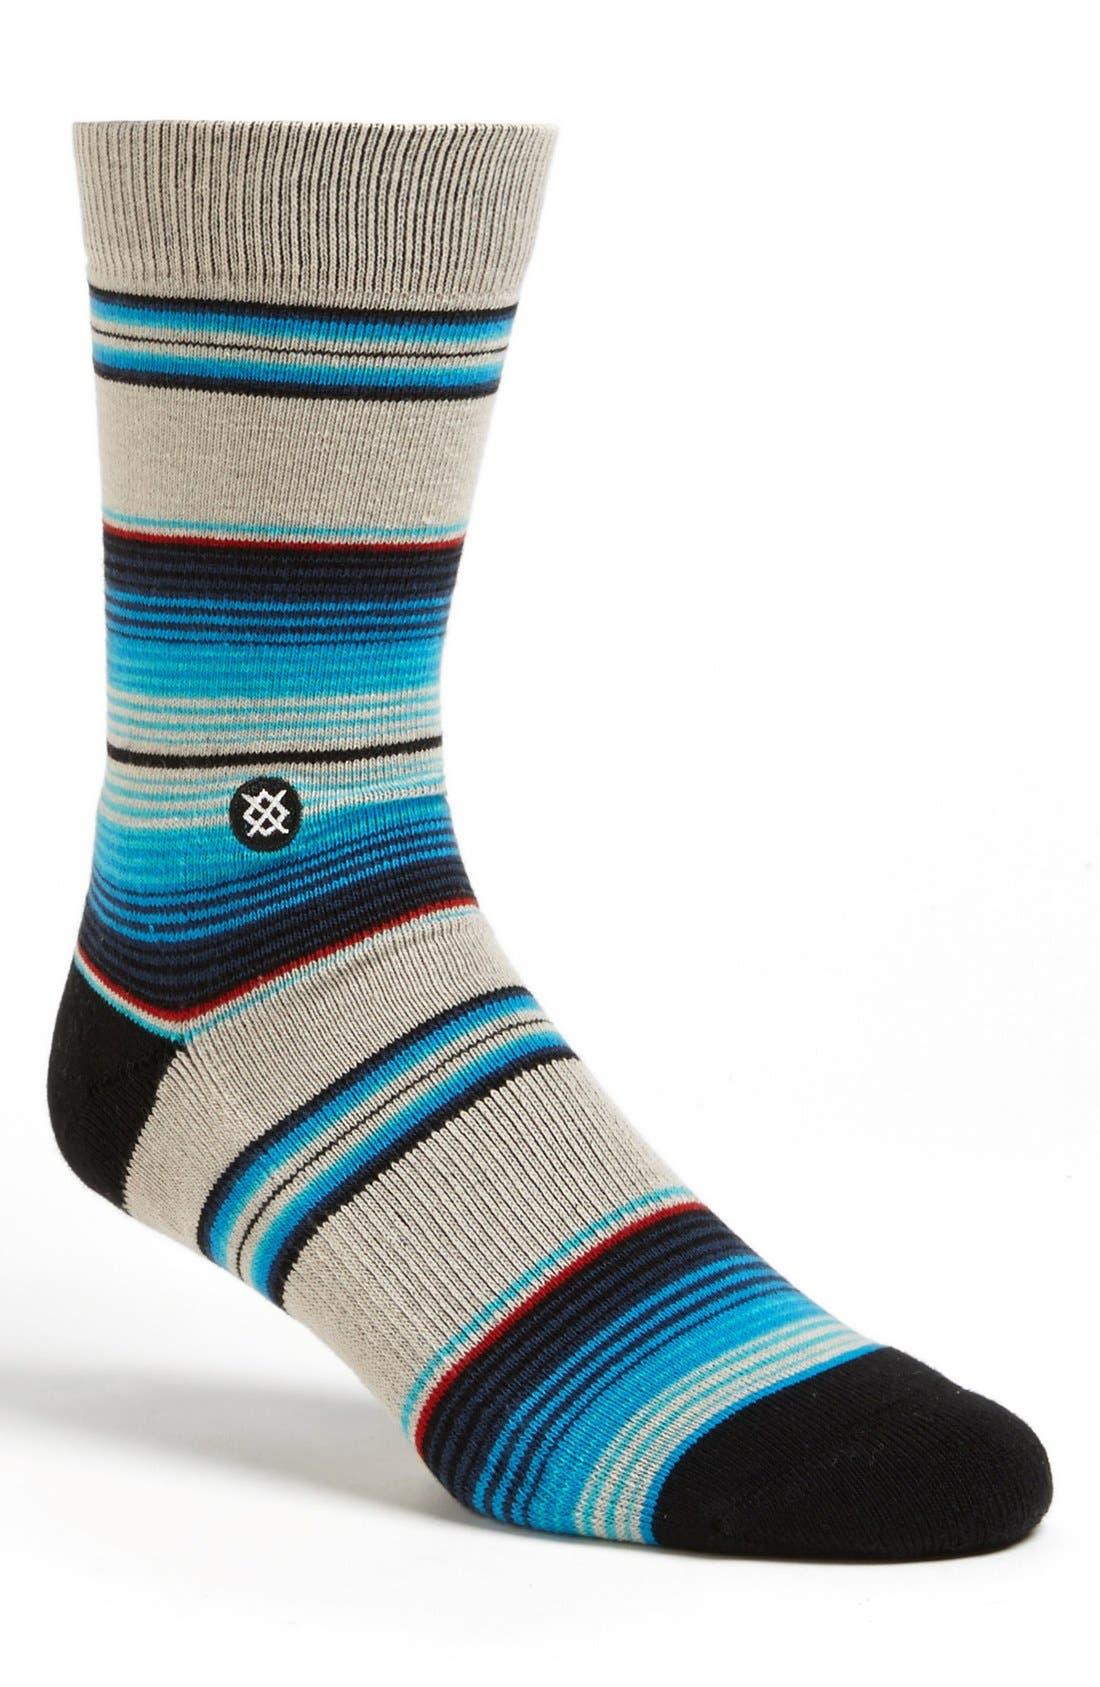 Alternate Image 1 Selected - Stance 'Salina Cruz' Socks